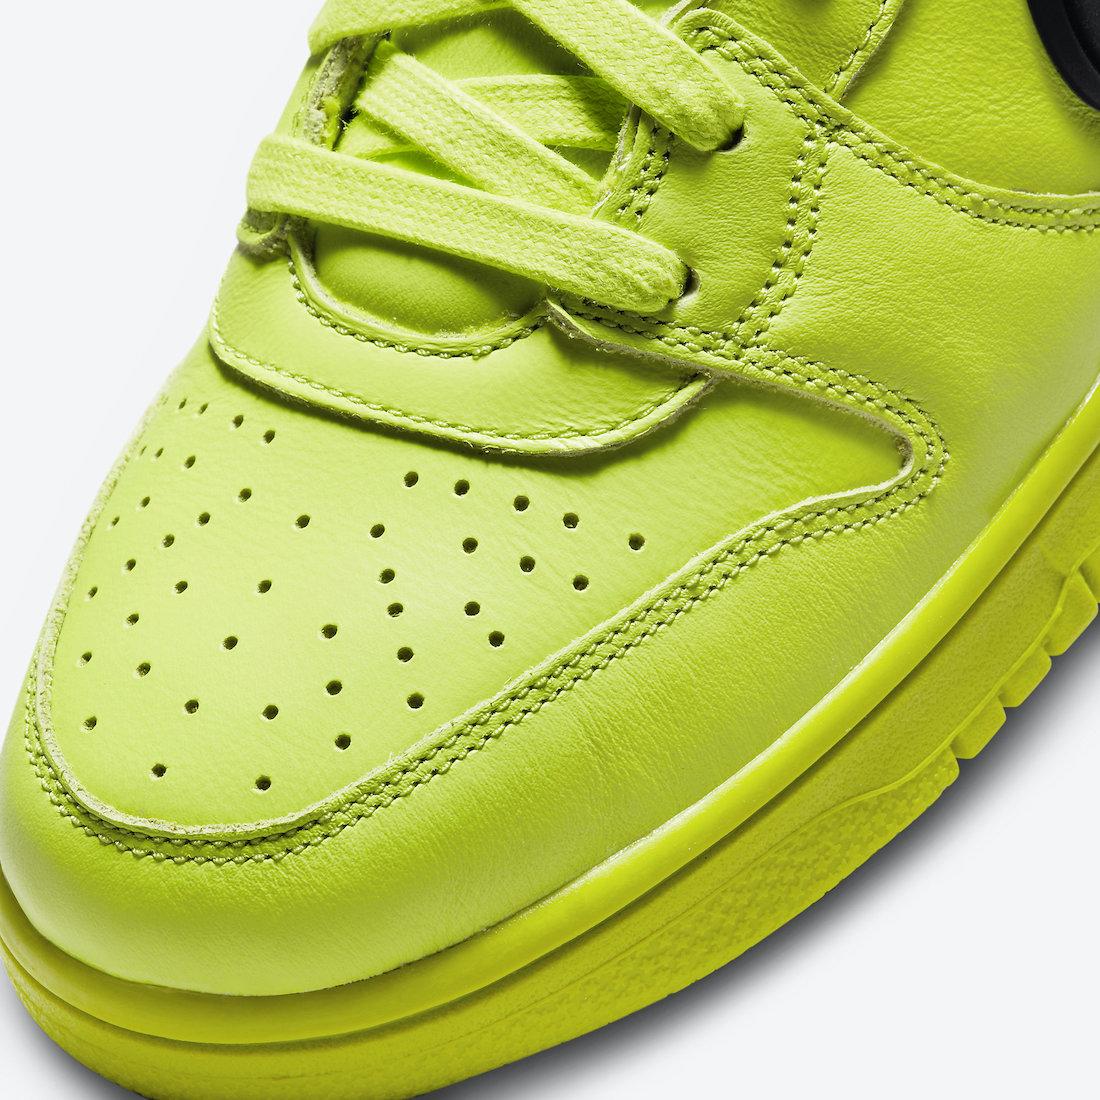 Ambush black grey nike shoes blue swoosh boots for women Flash Lime CU7544-300 Release Date